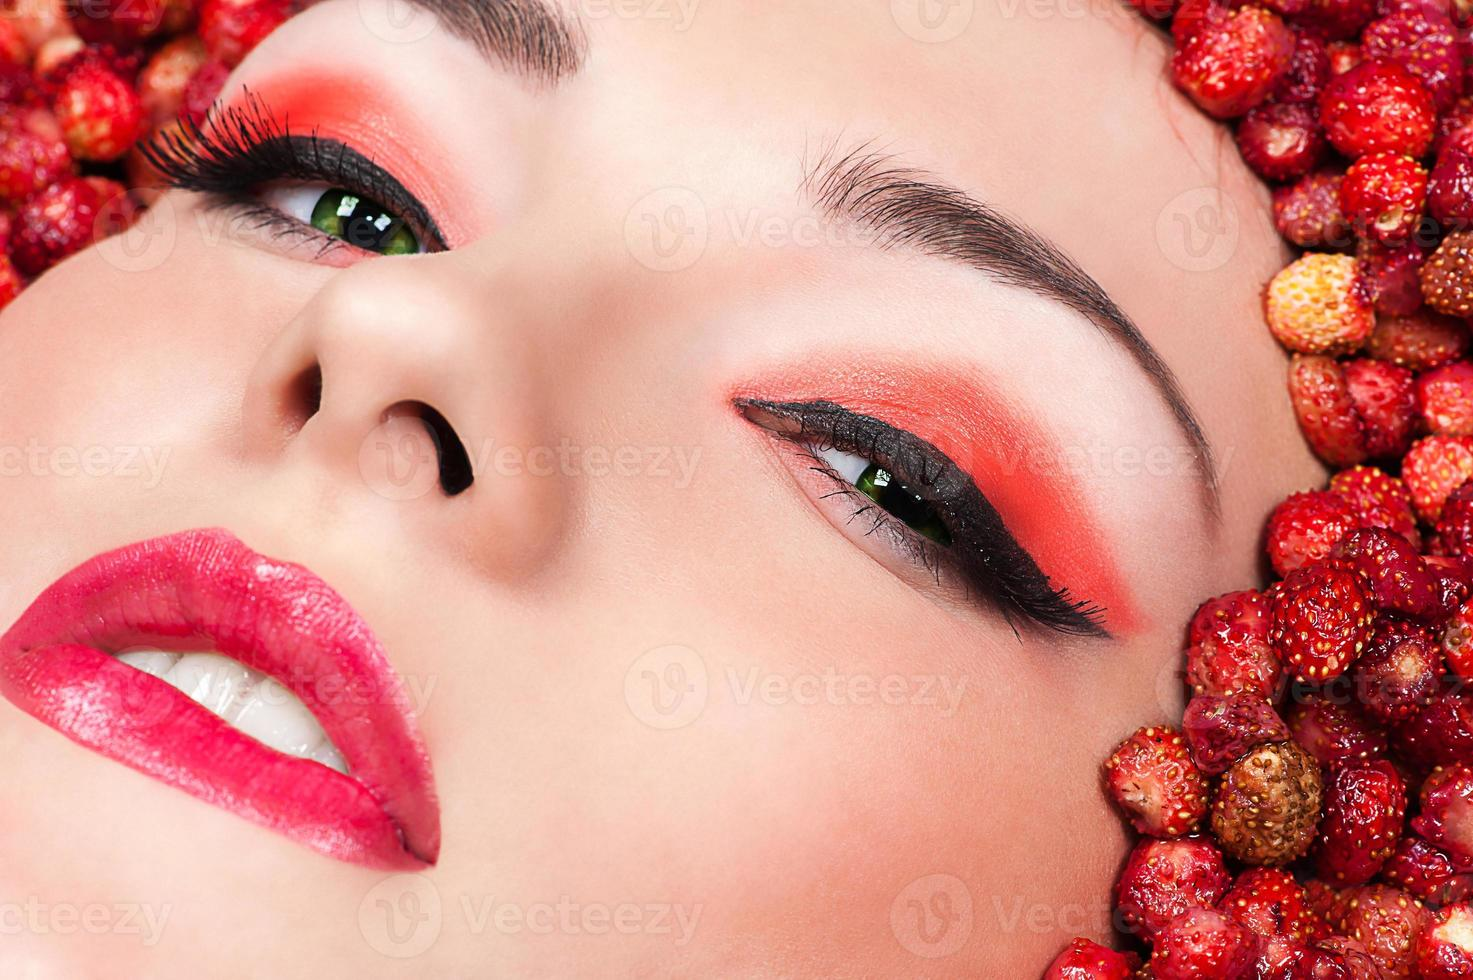 woman in wild strawberry closeup photo